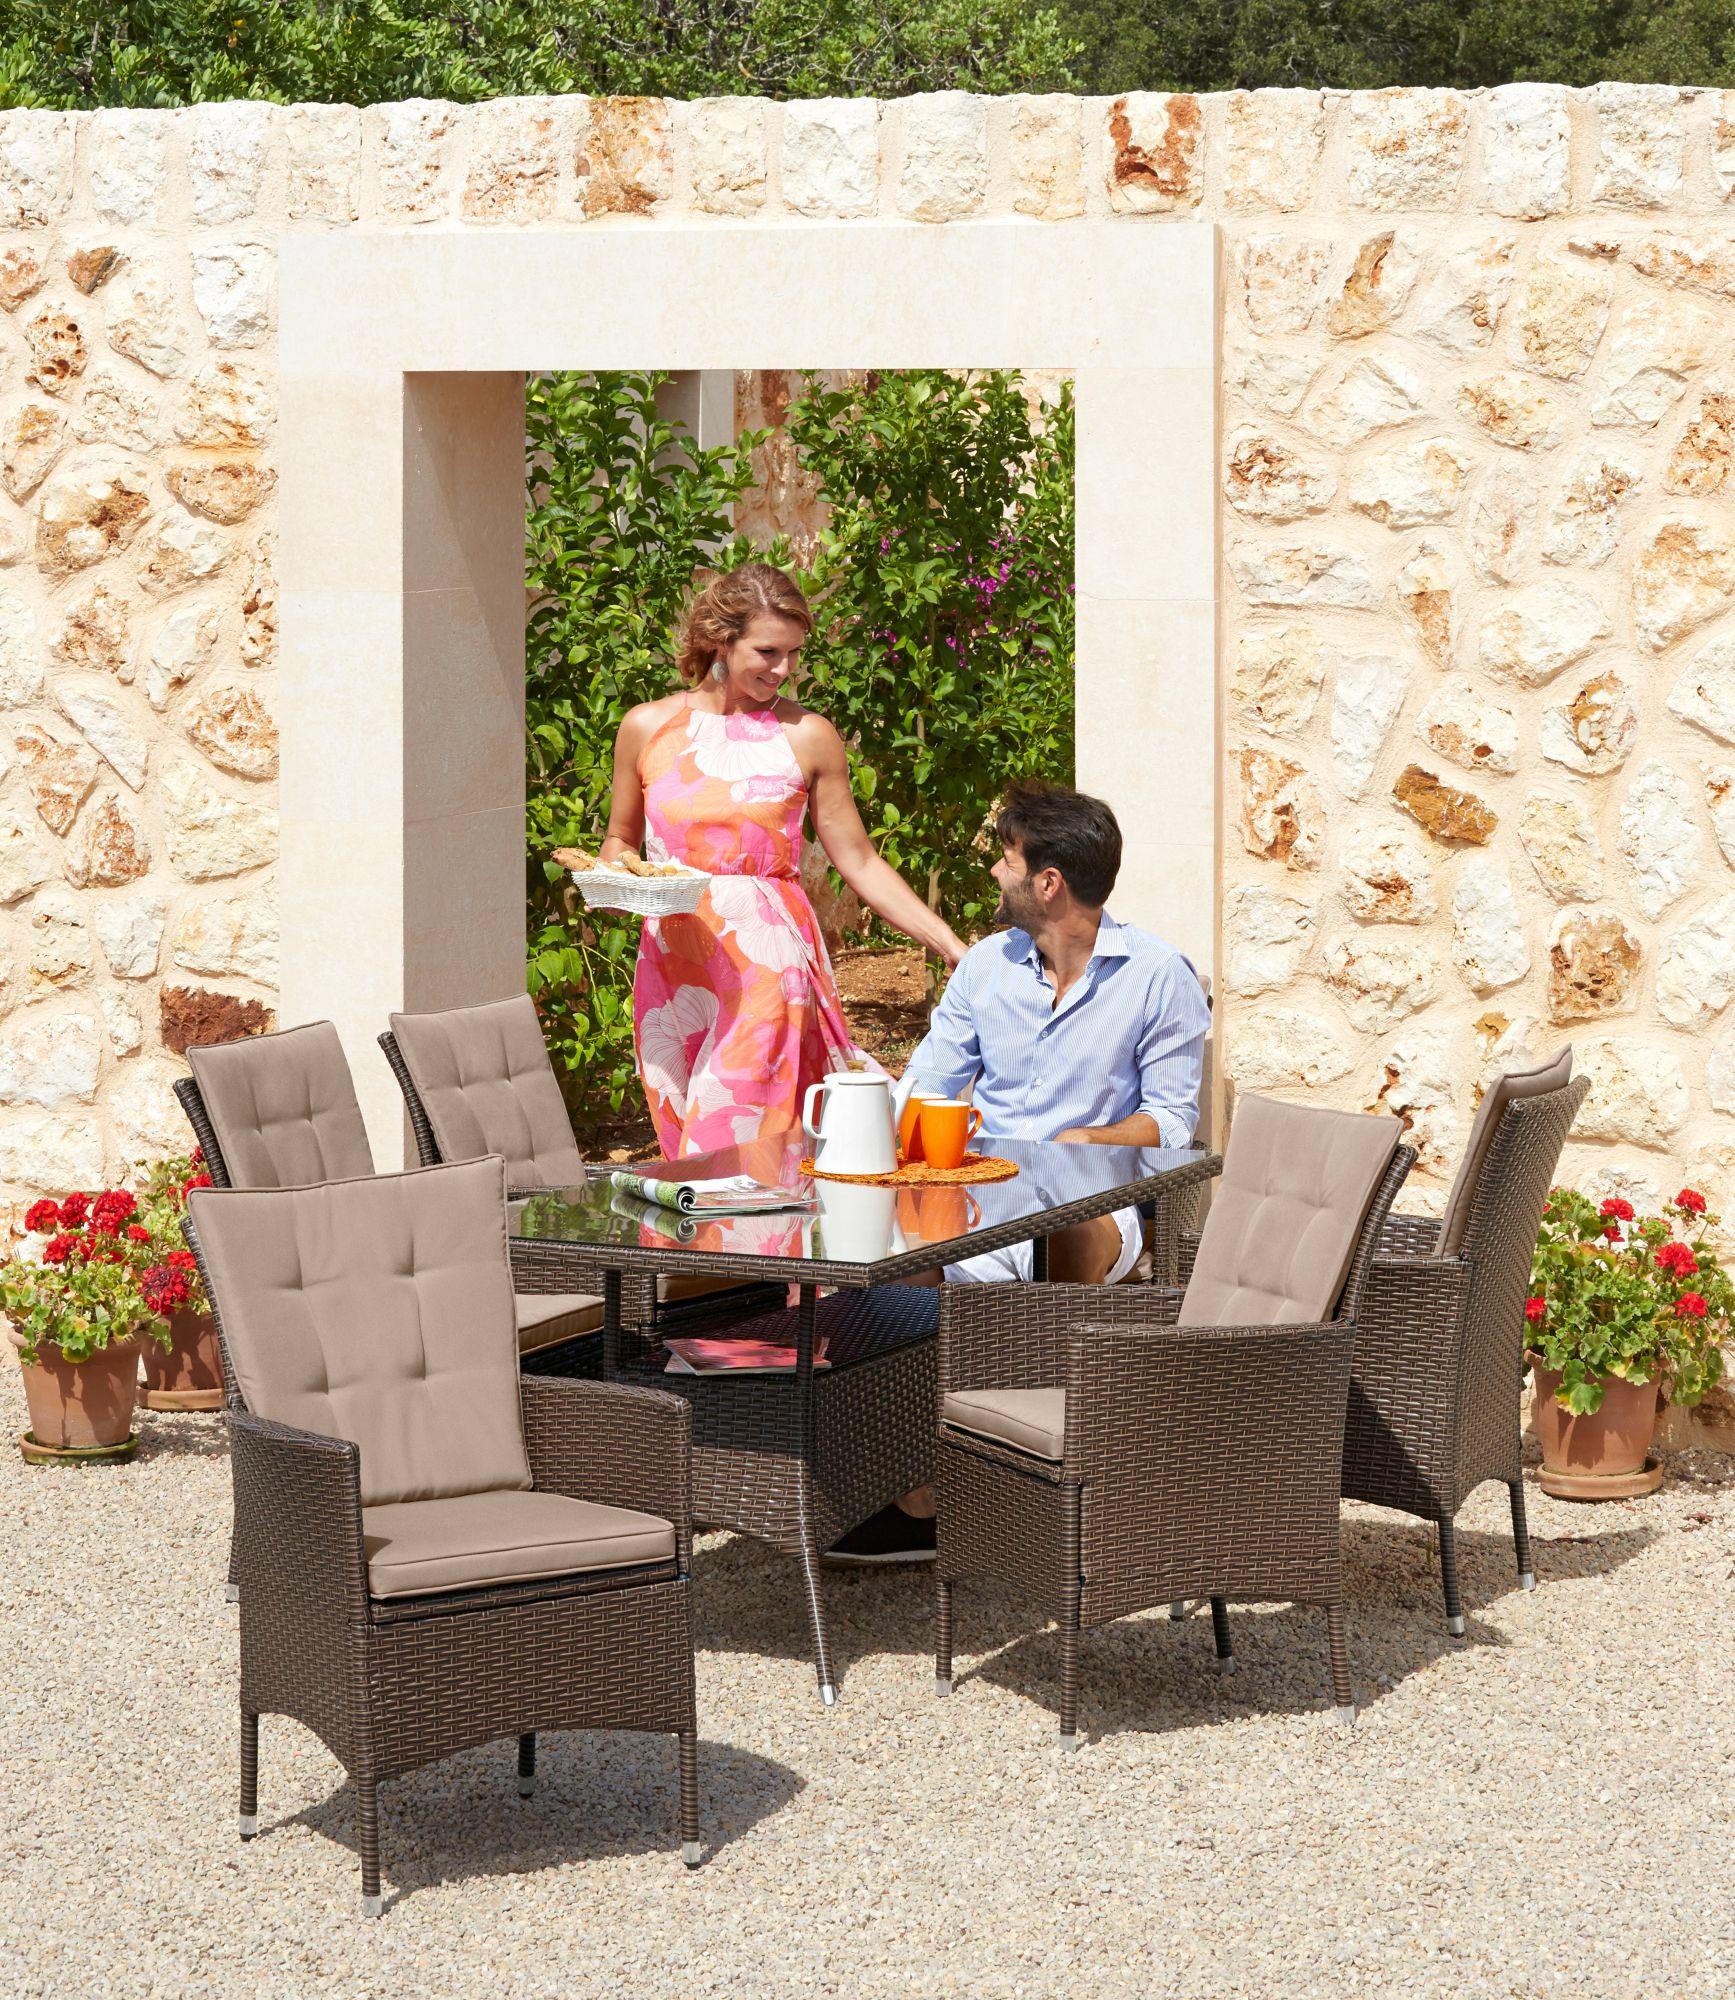 20-tgl. Gartenmöbelset »Santiago New«, 6 Sessel, Tisch 150x80 cm, Polyrattan